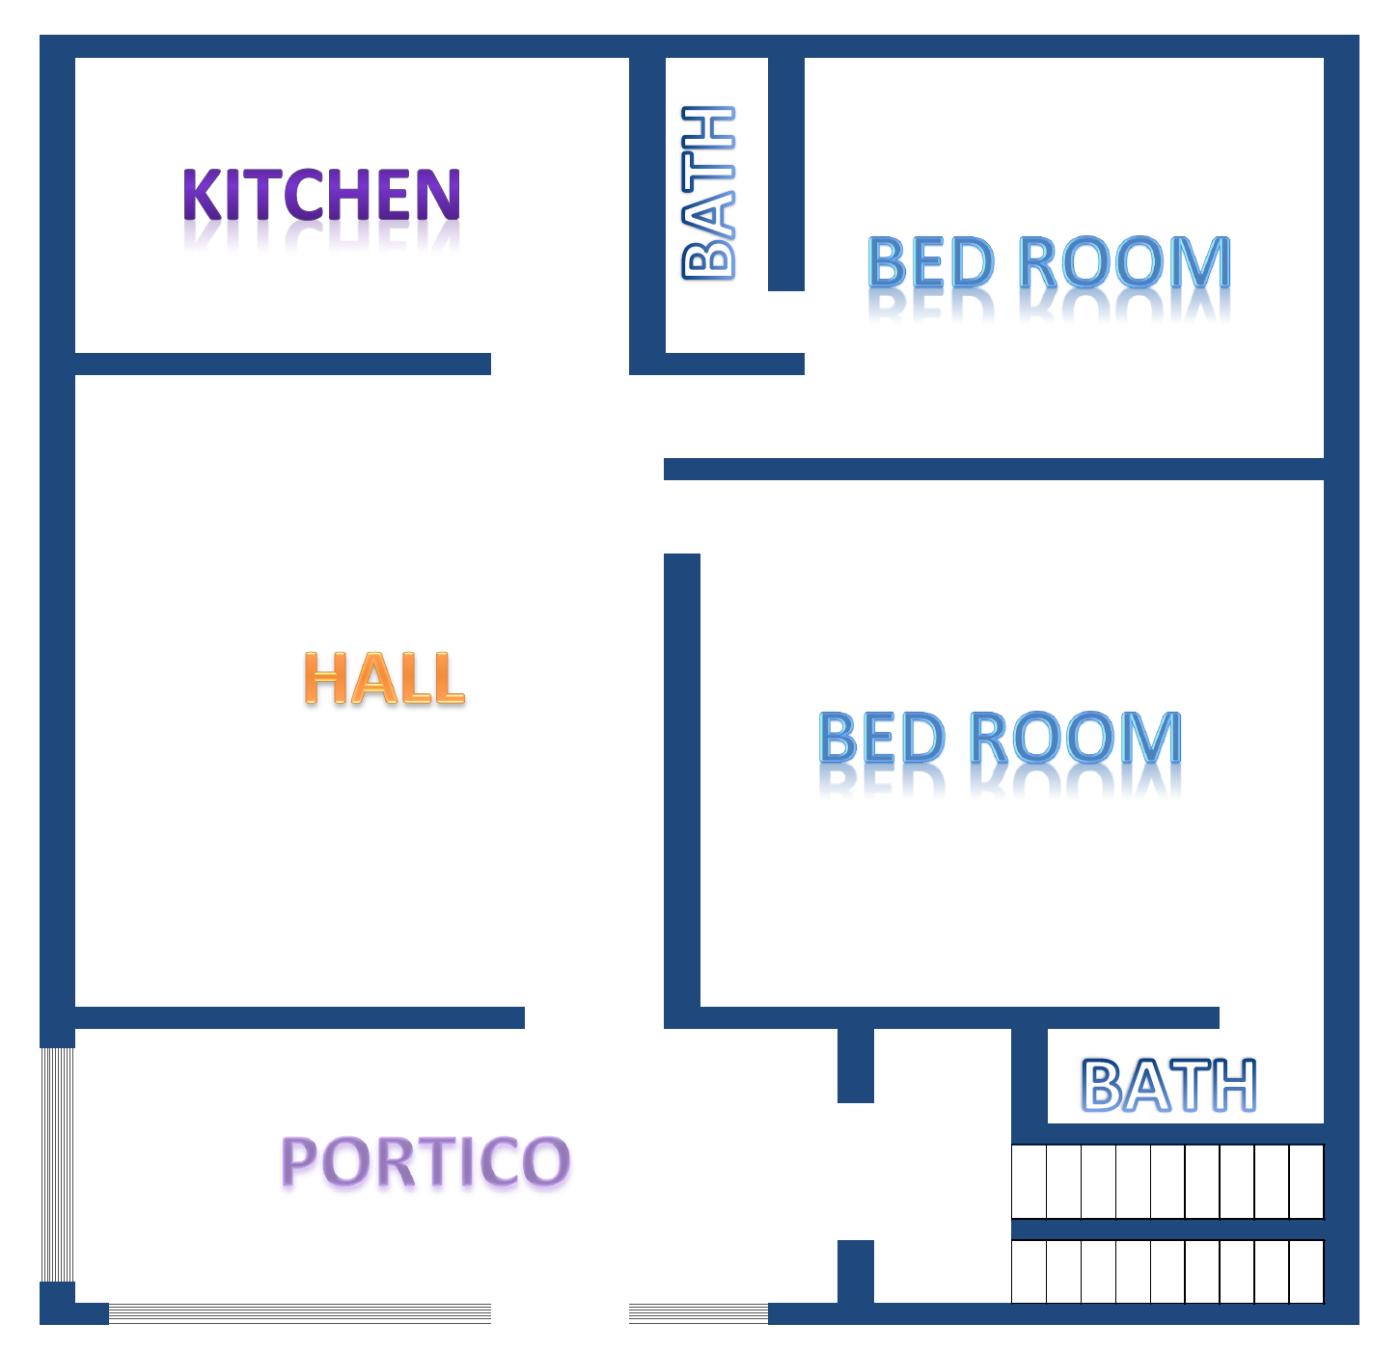 House plan per vastu nice double bedroom house plan per vastu on - Vastu Home Plans For North Facing Simple House Plans 2000 Square Feet